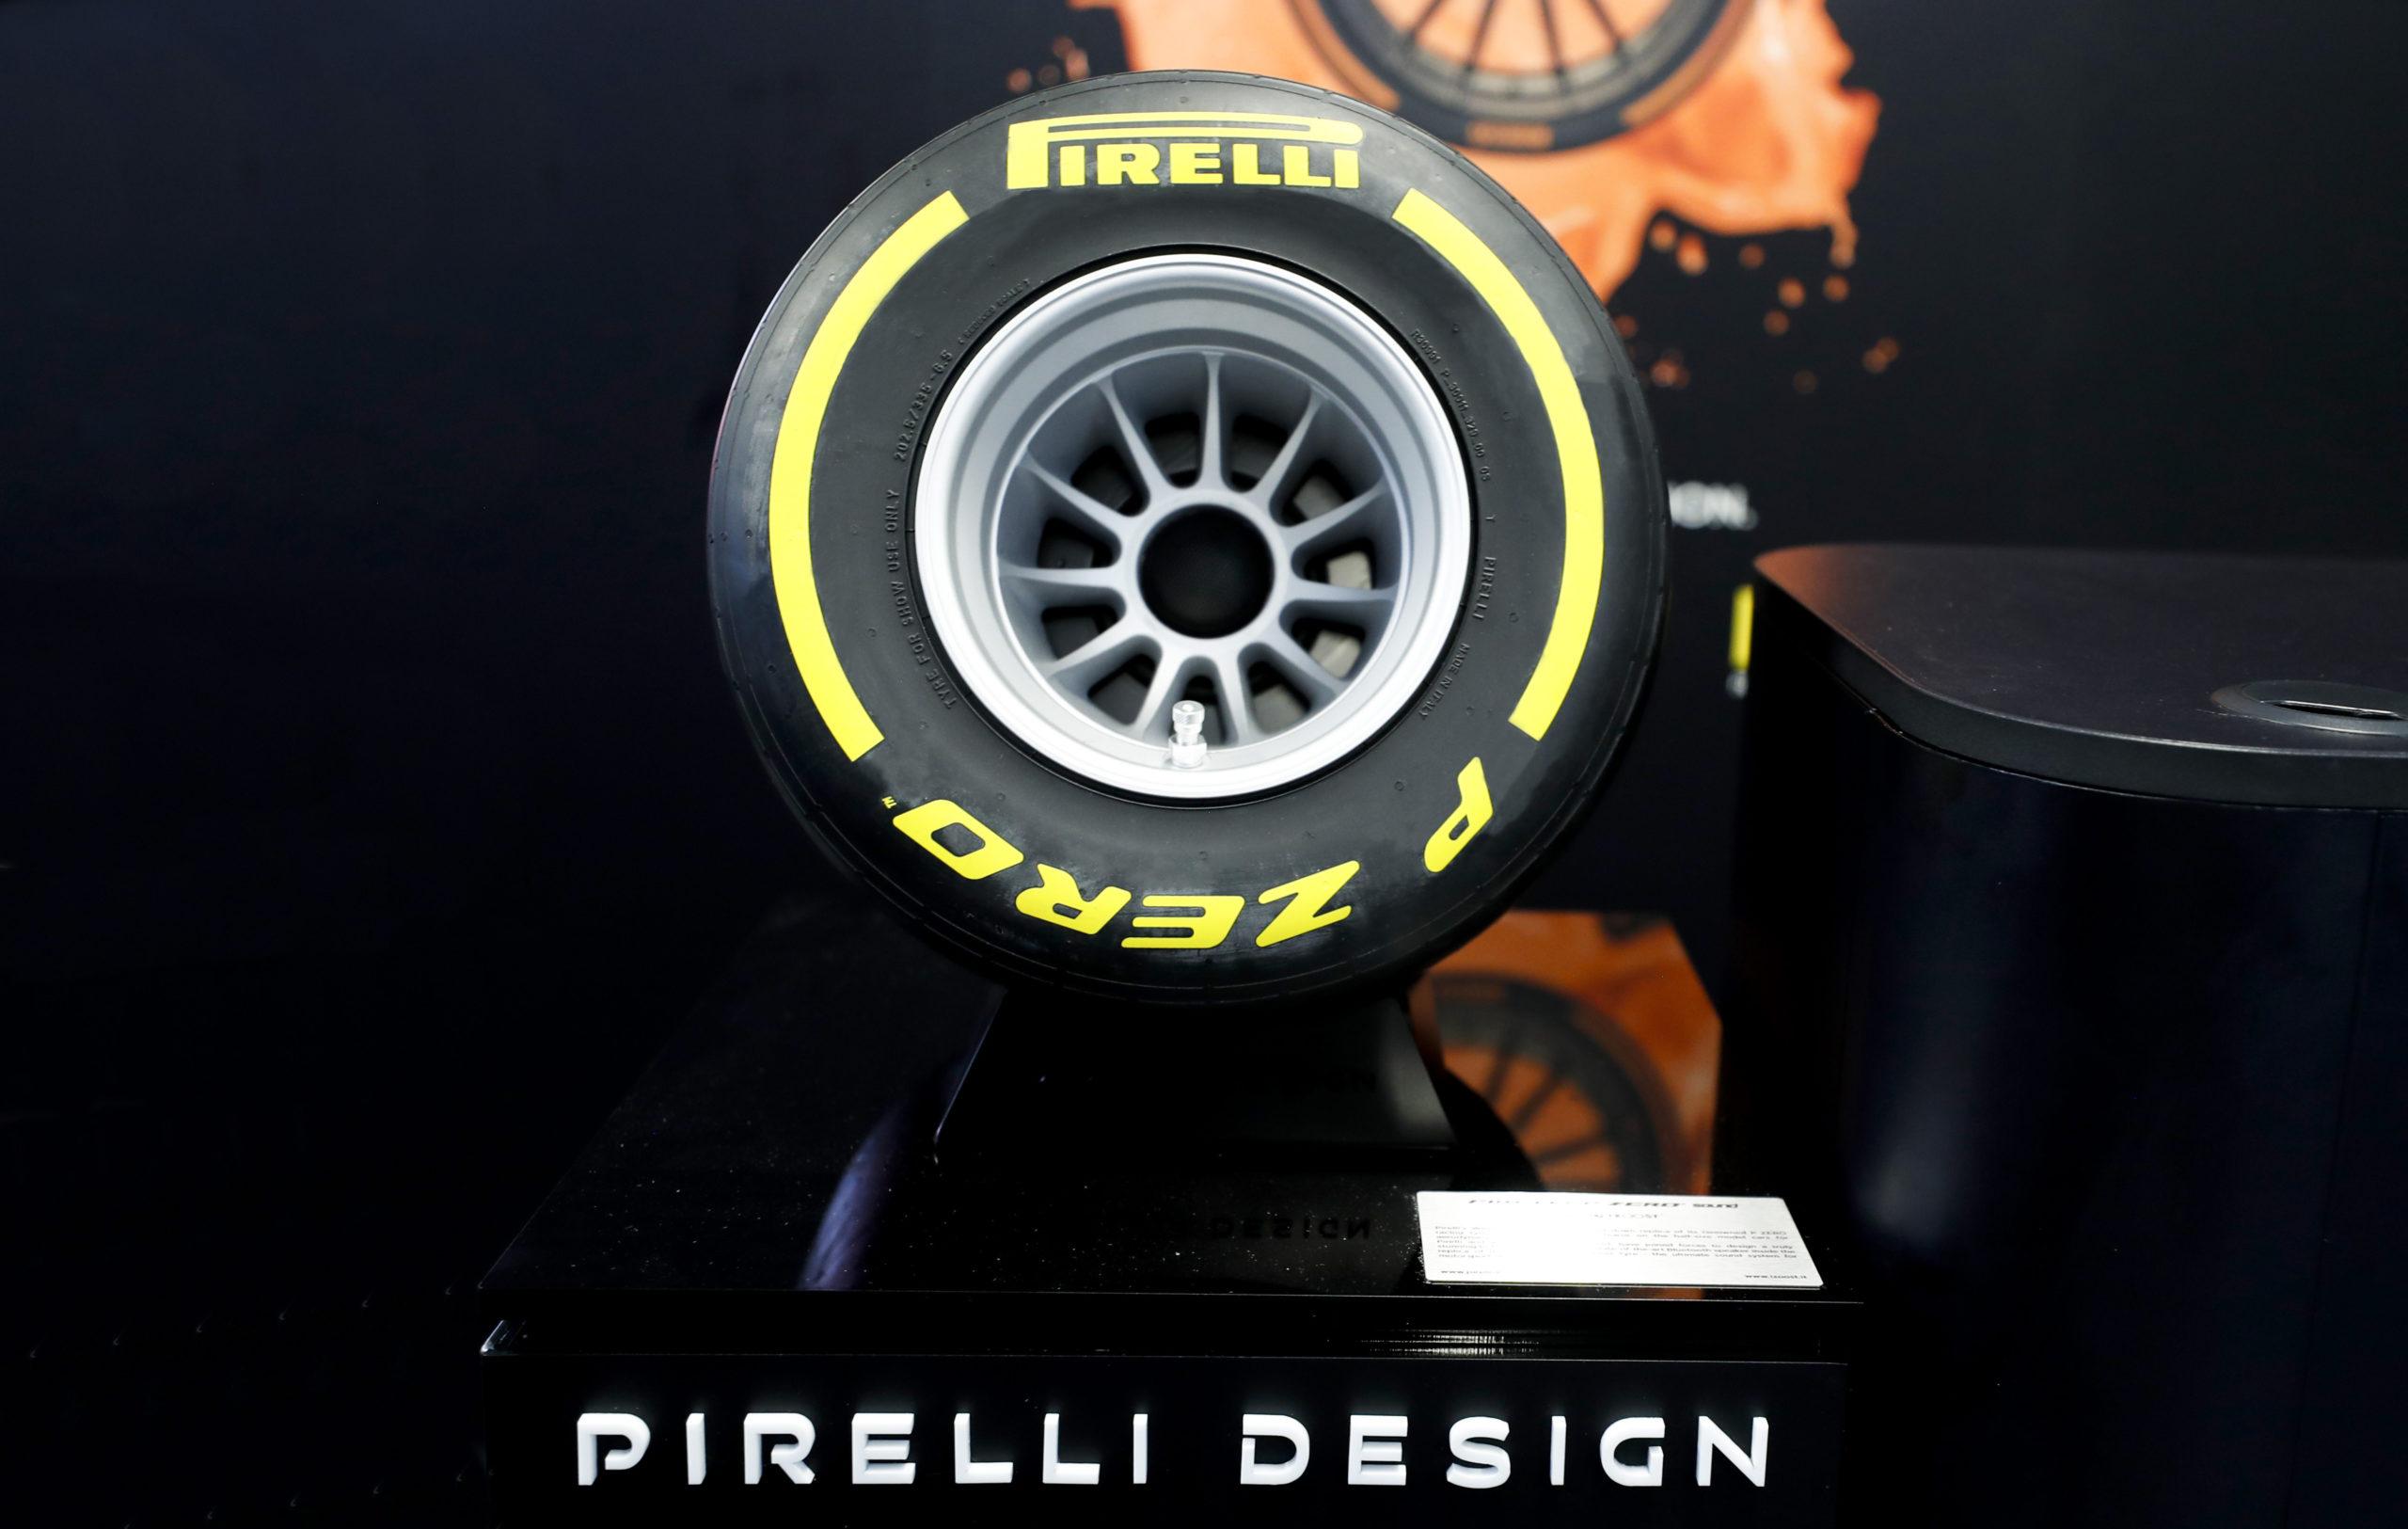 Pirelli's IXOOST speaker